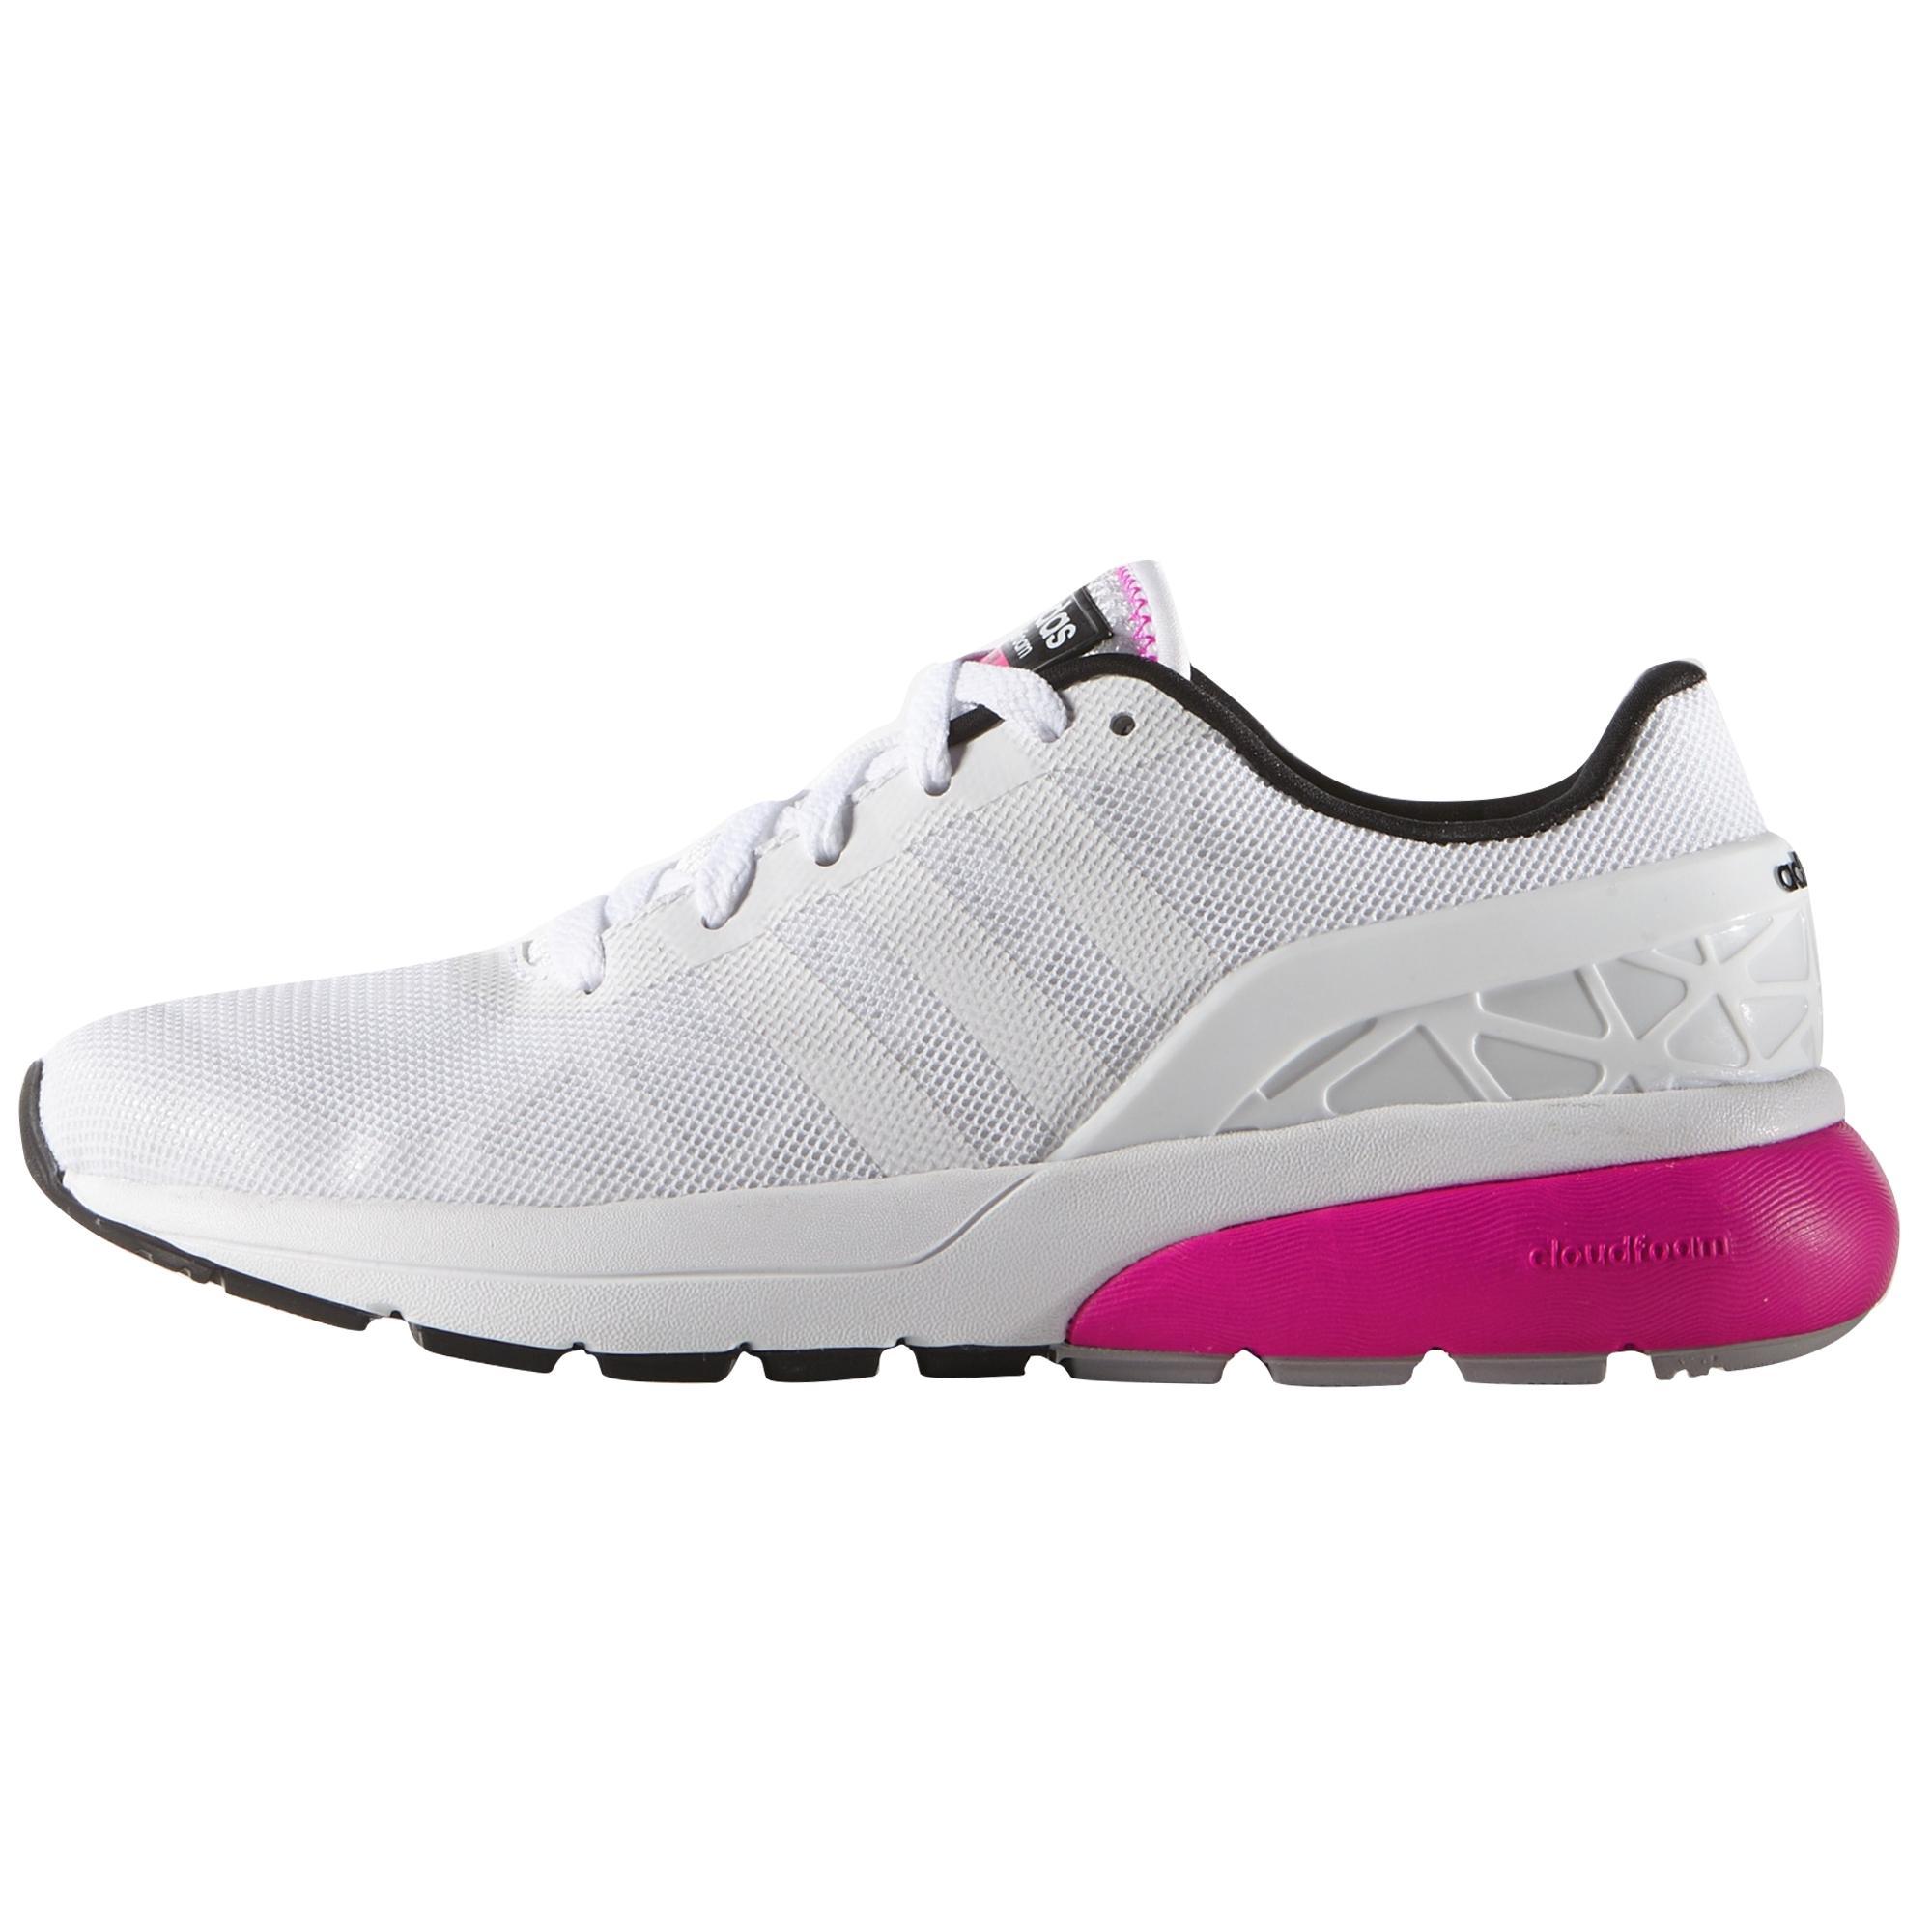 adidas Cloudfoam Flow SS16 Kadın Spor Ayakkabı